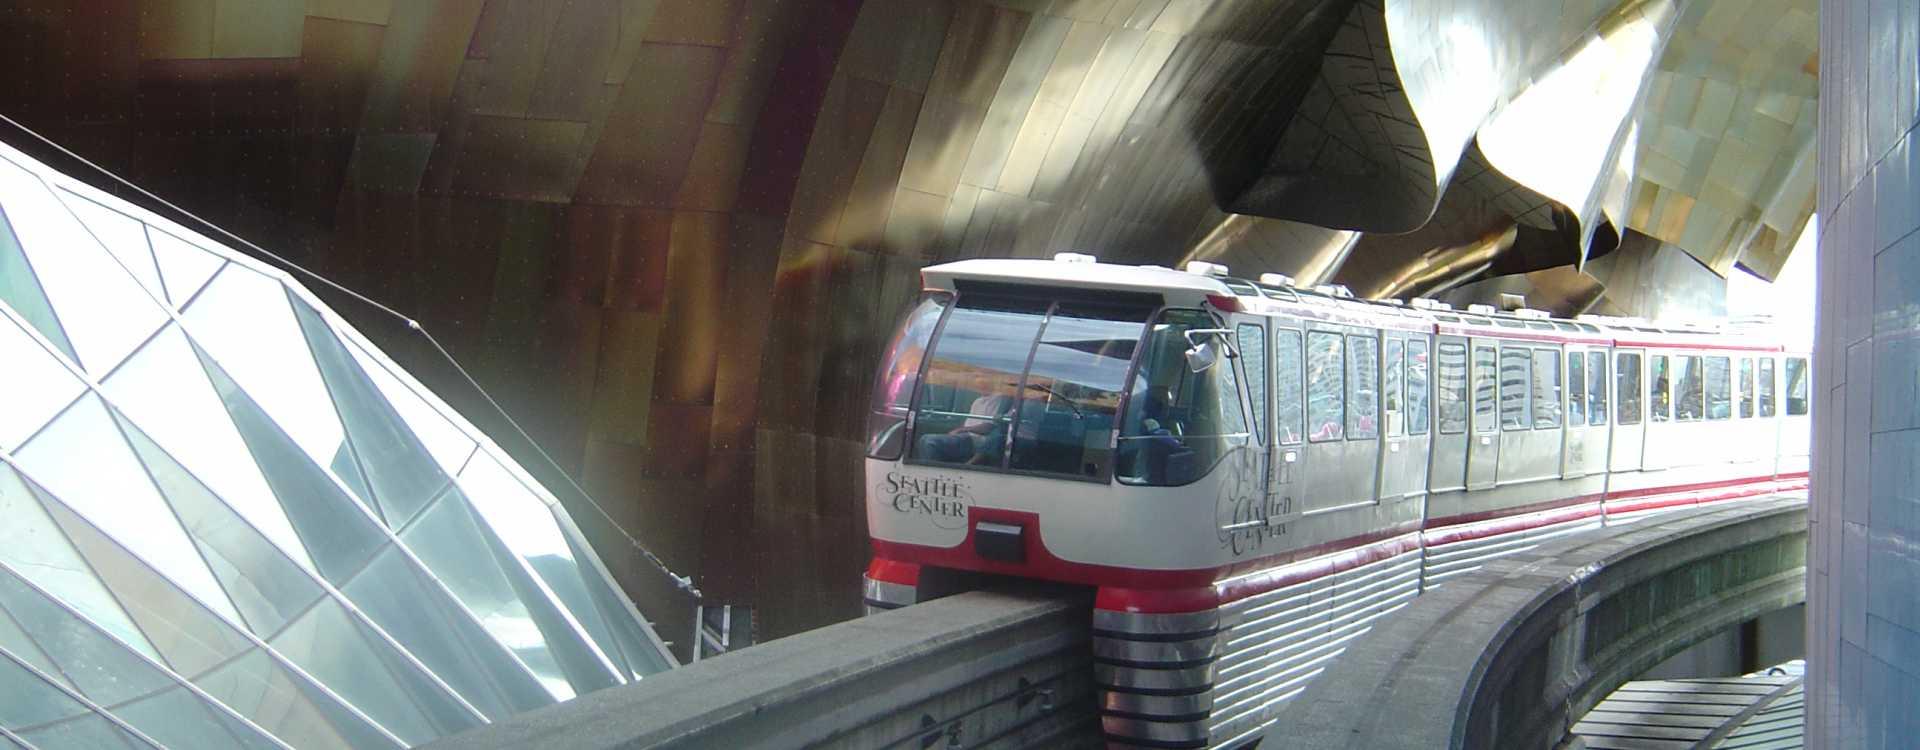 Seattle_Monorail-2.jpg